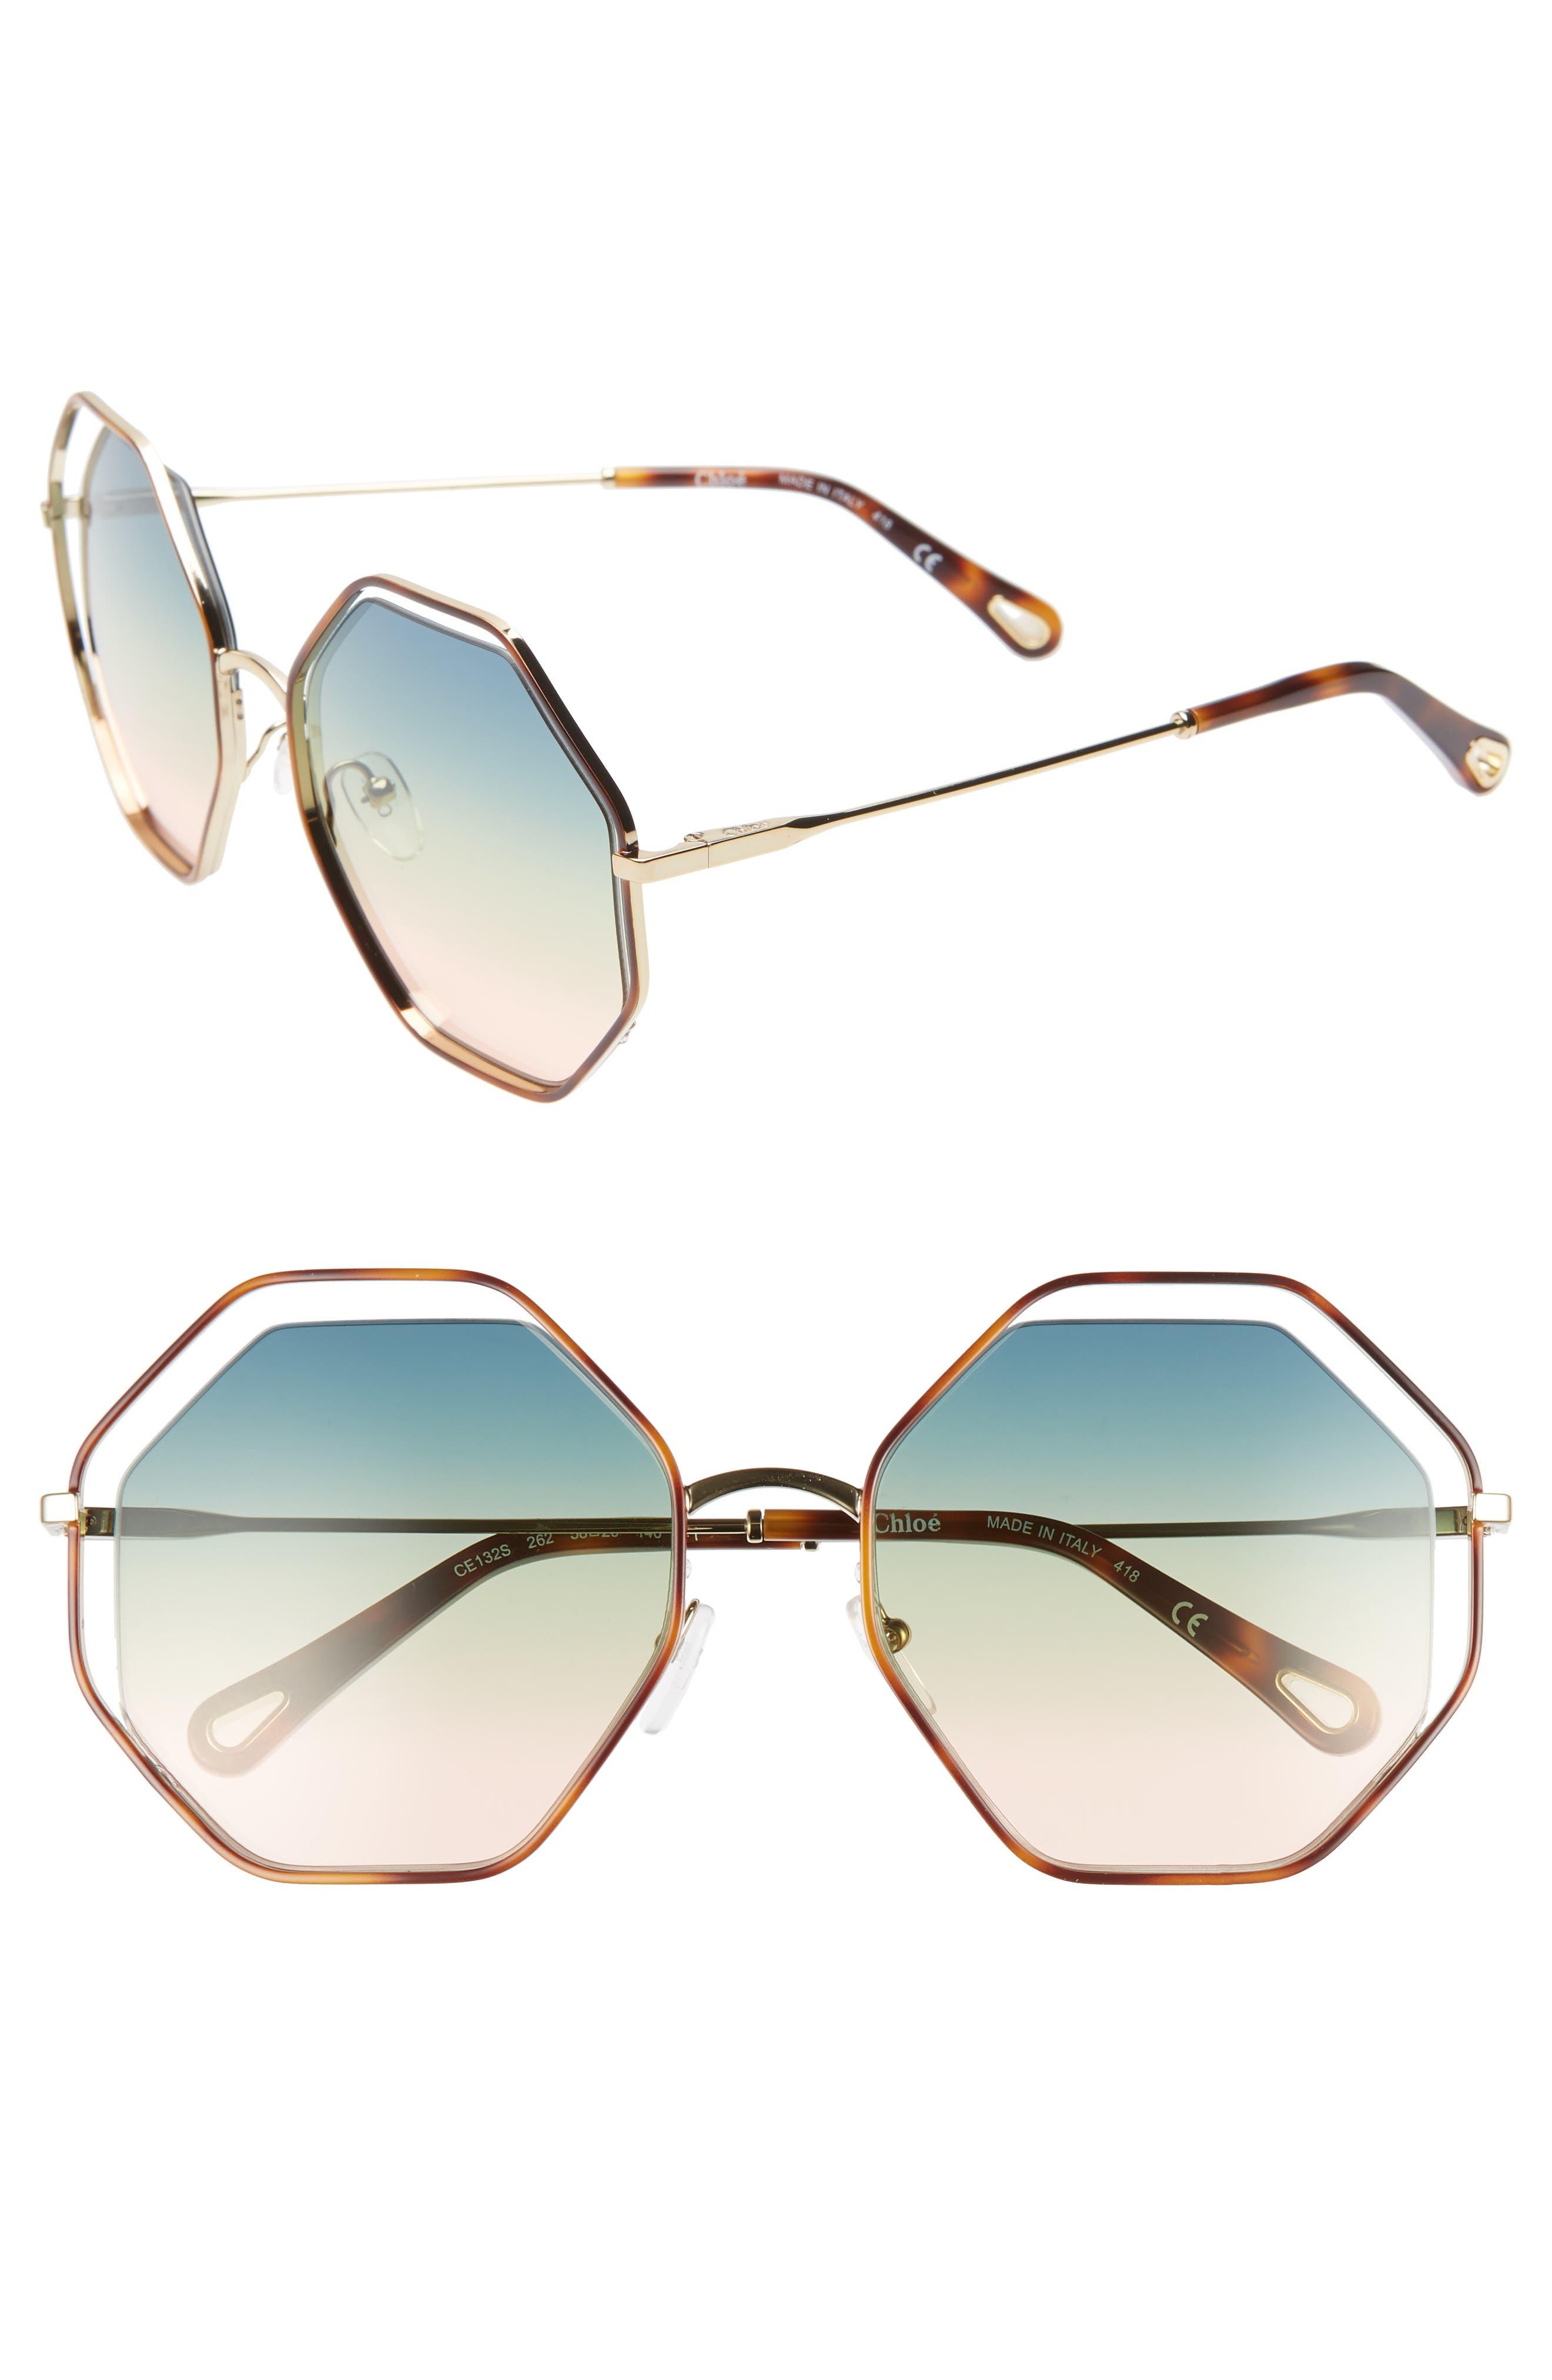 Chloe 5m Octagonal Halo Lens Sunglasses - Havana/ Gradient Blue